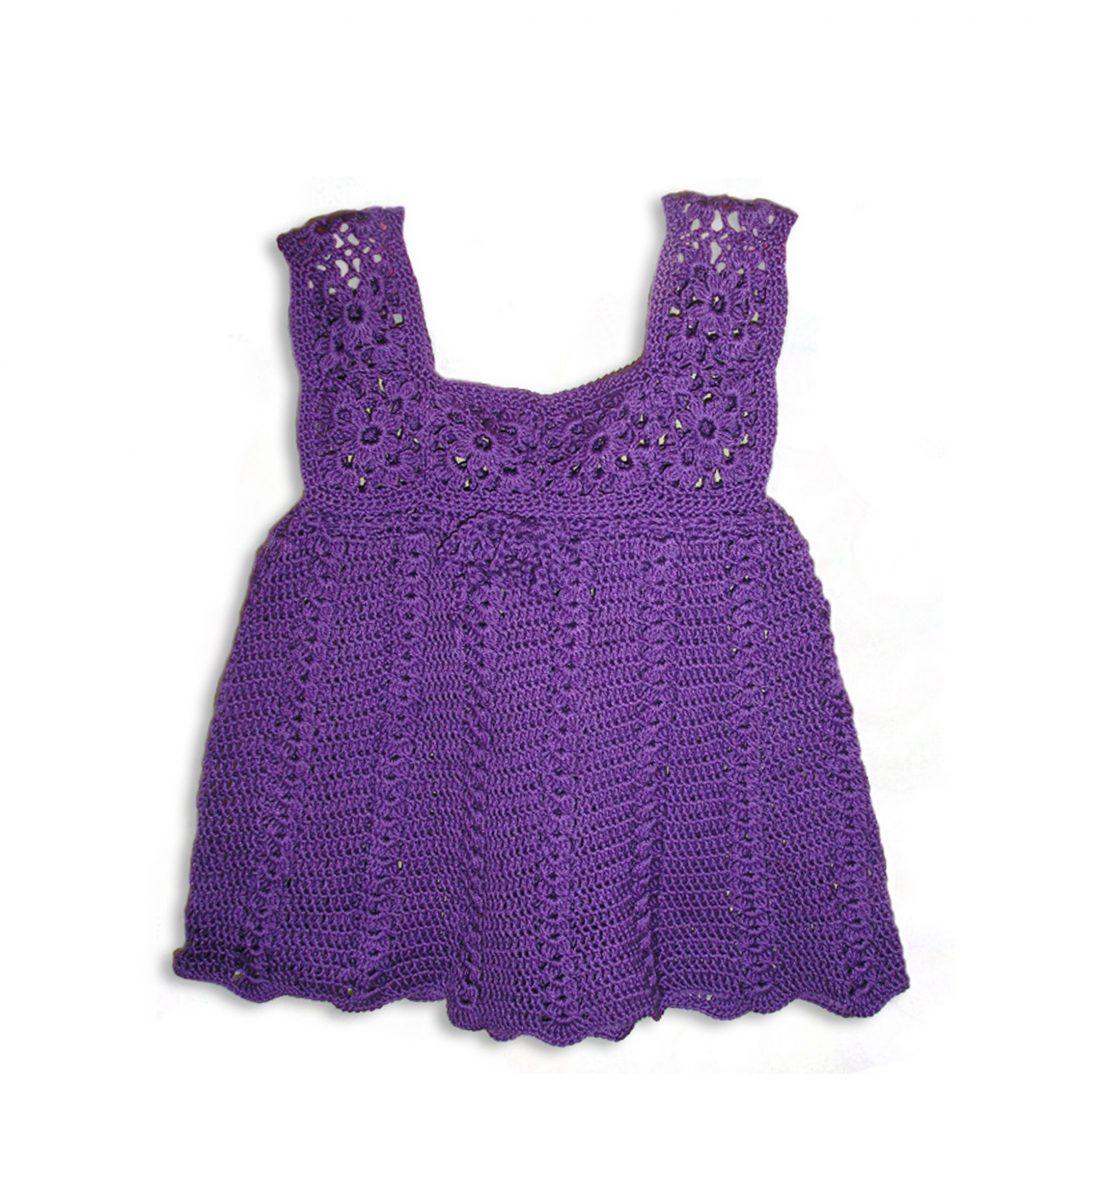 Crochet Soft Cotton Dress 1037 purple